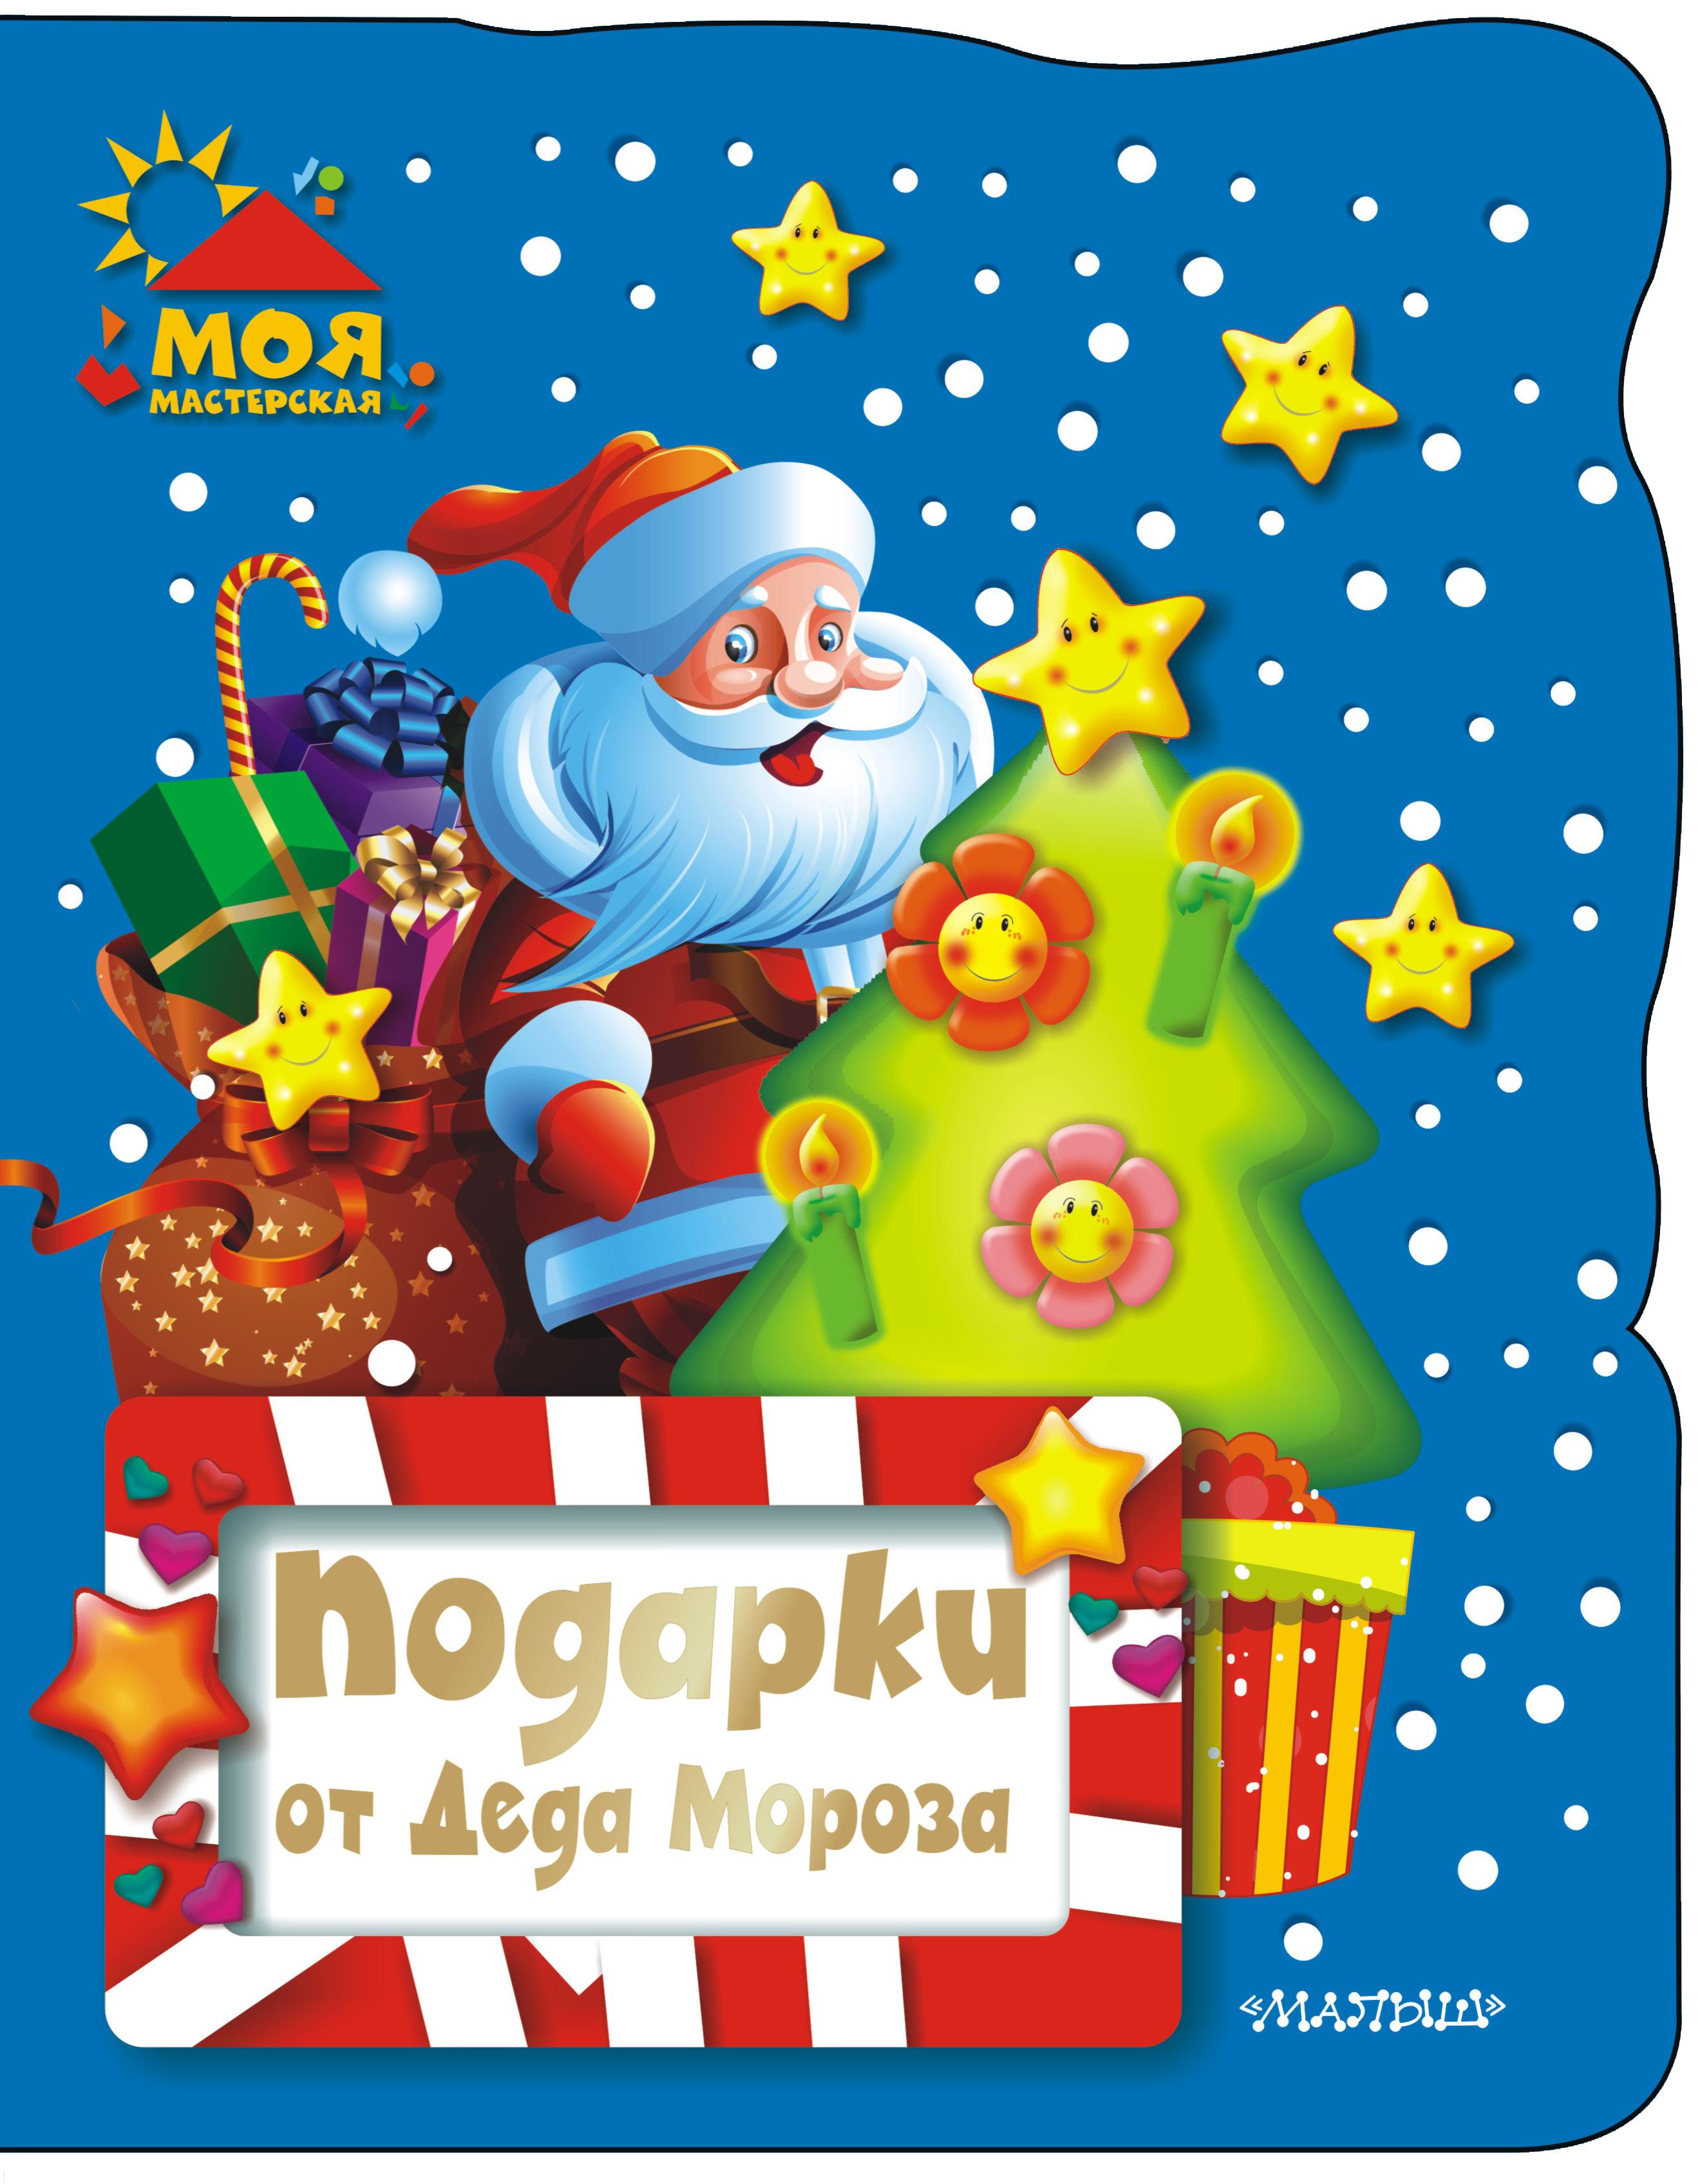 . Подарки от Деда Мороза